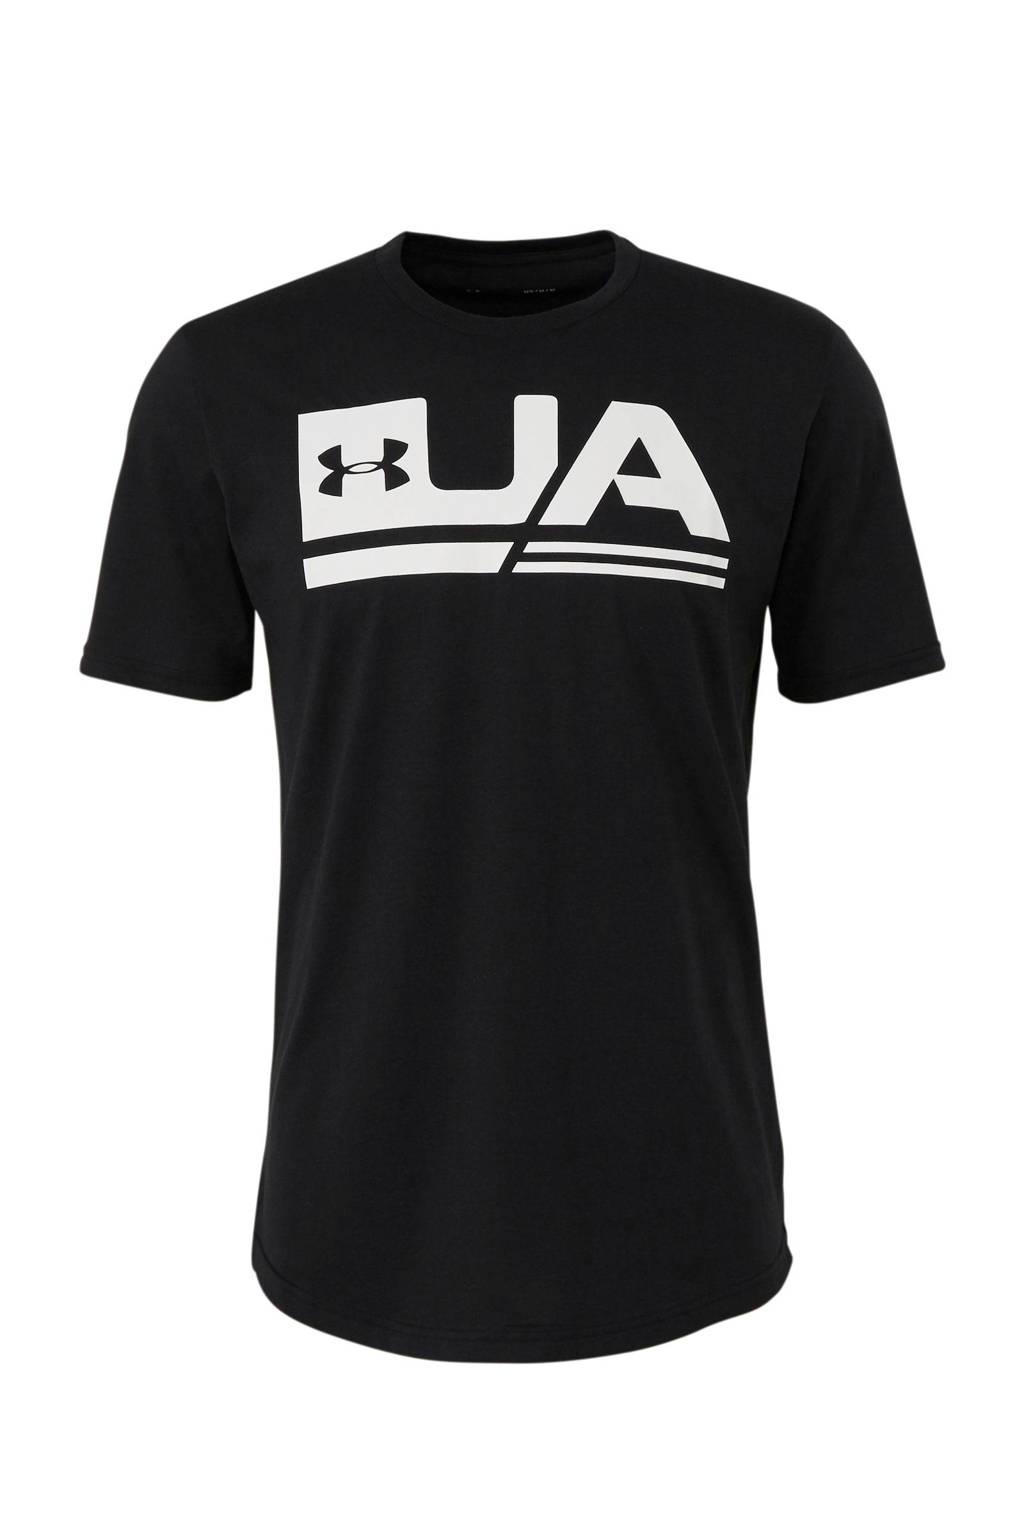 Under Armour   sport T-shirt zwrt, Zwart/wit